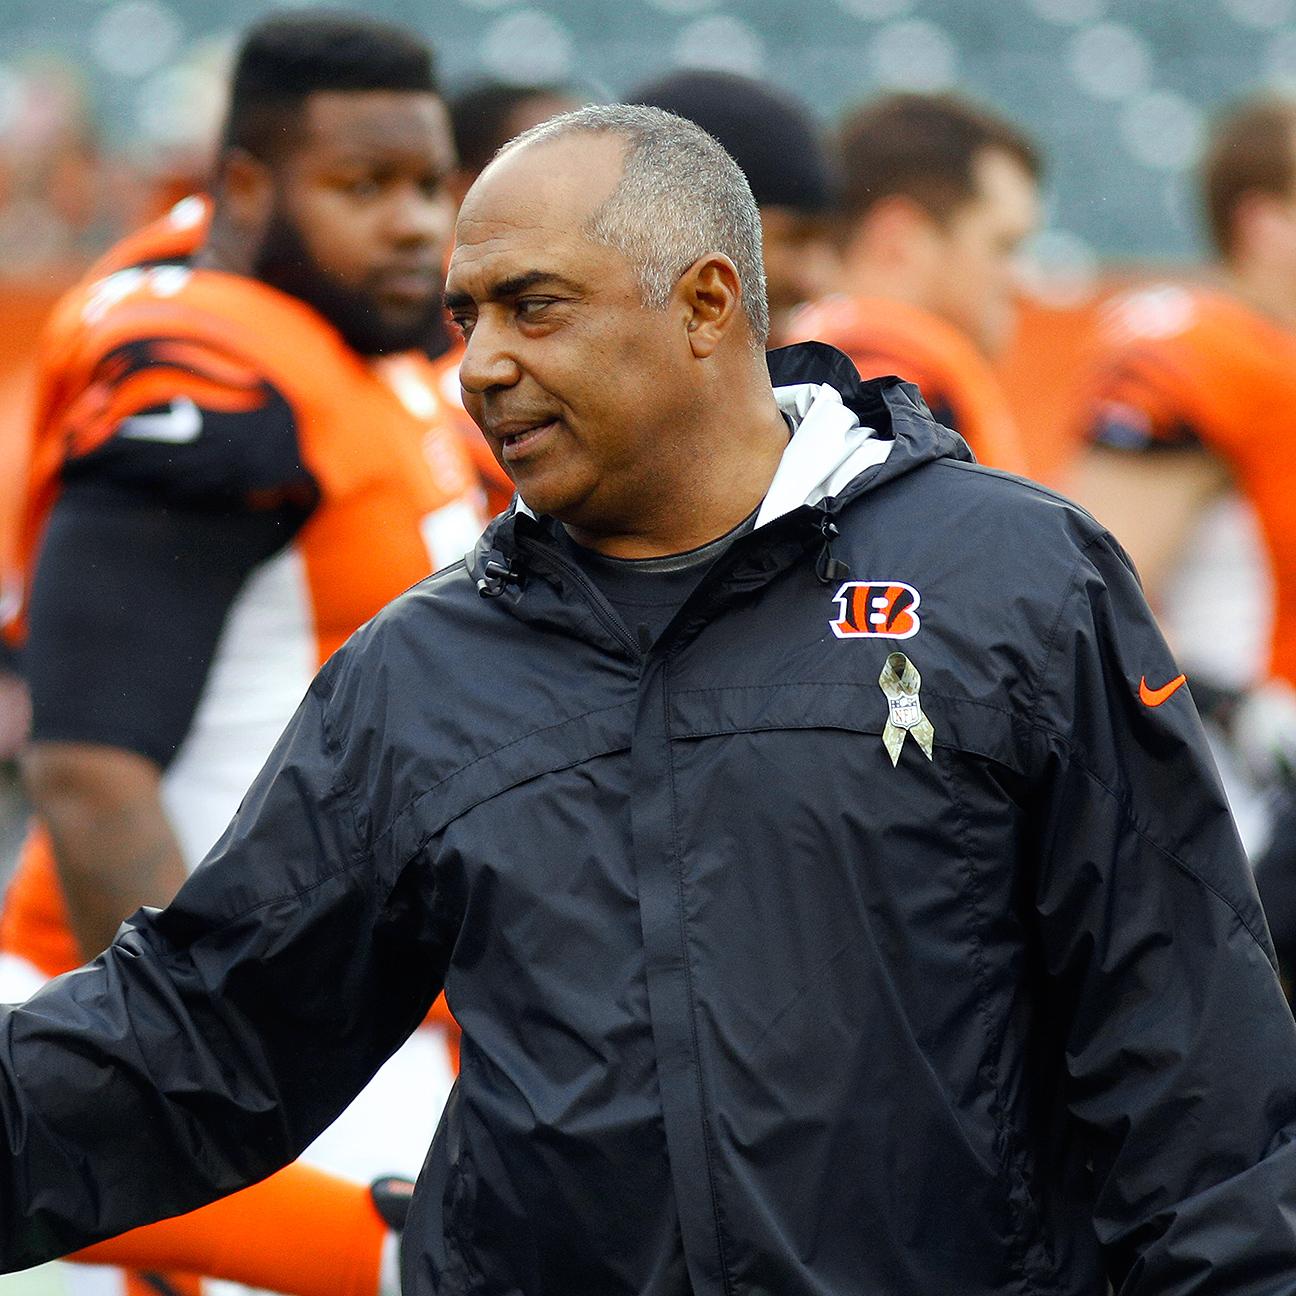 Cleveland Browns rank 142nd in ESPN international salary survey